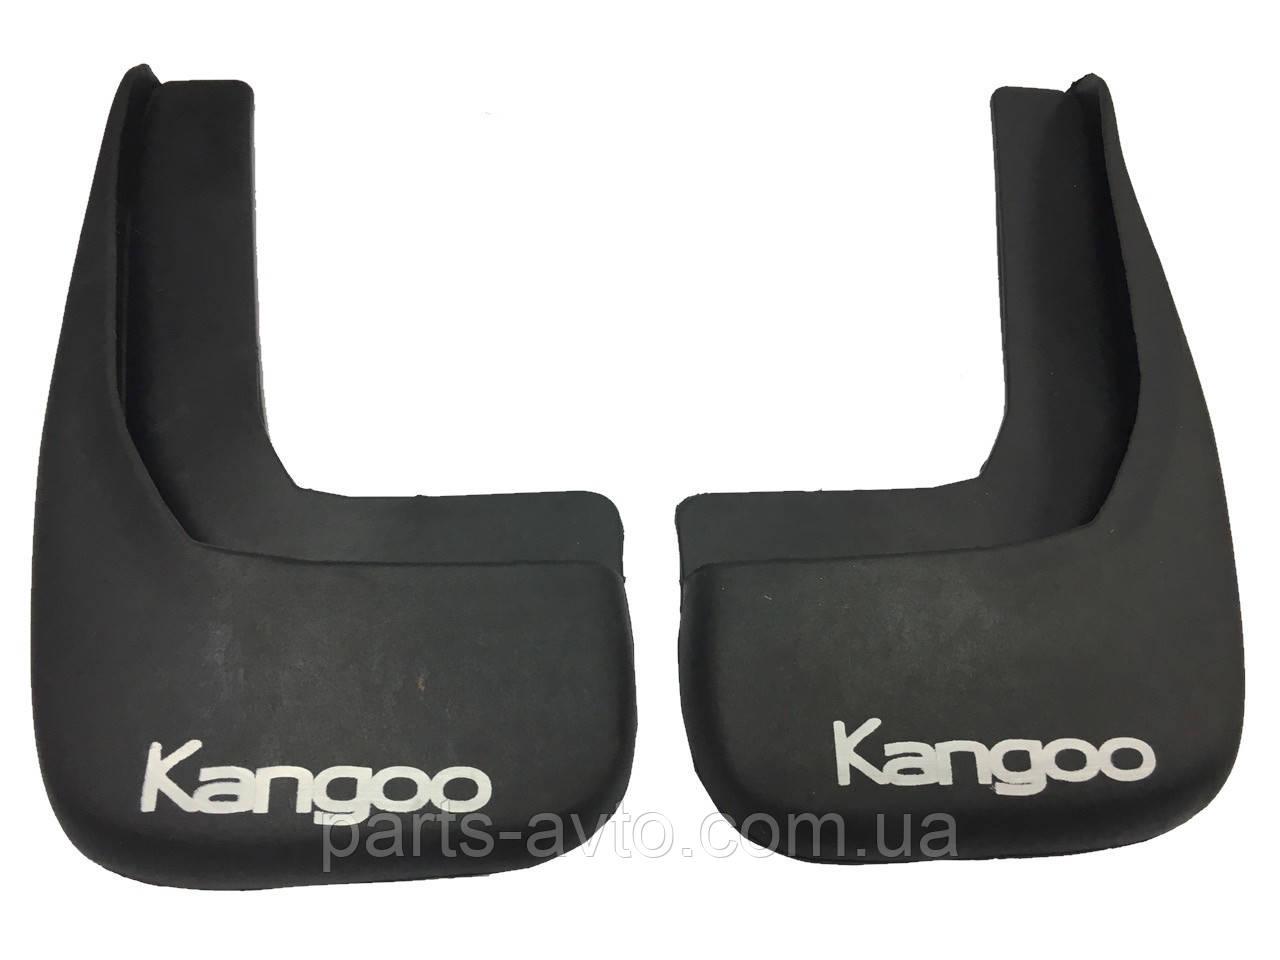 Брызговики задние для Renault Kangoo 97-08 комплект 2шт rnt-140